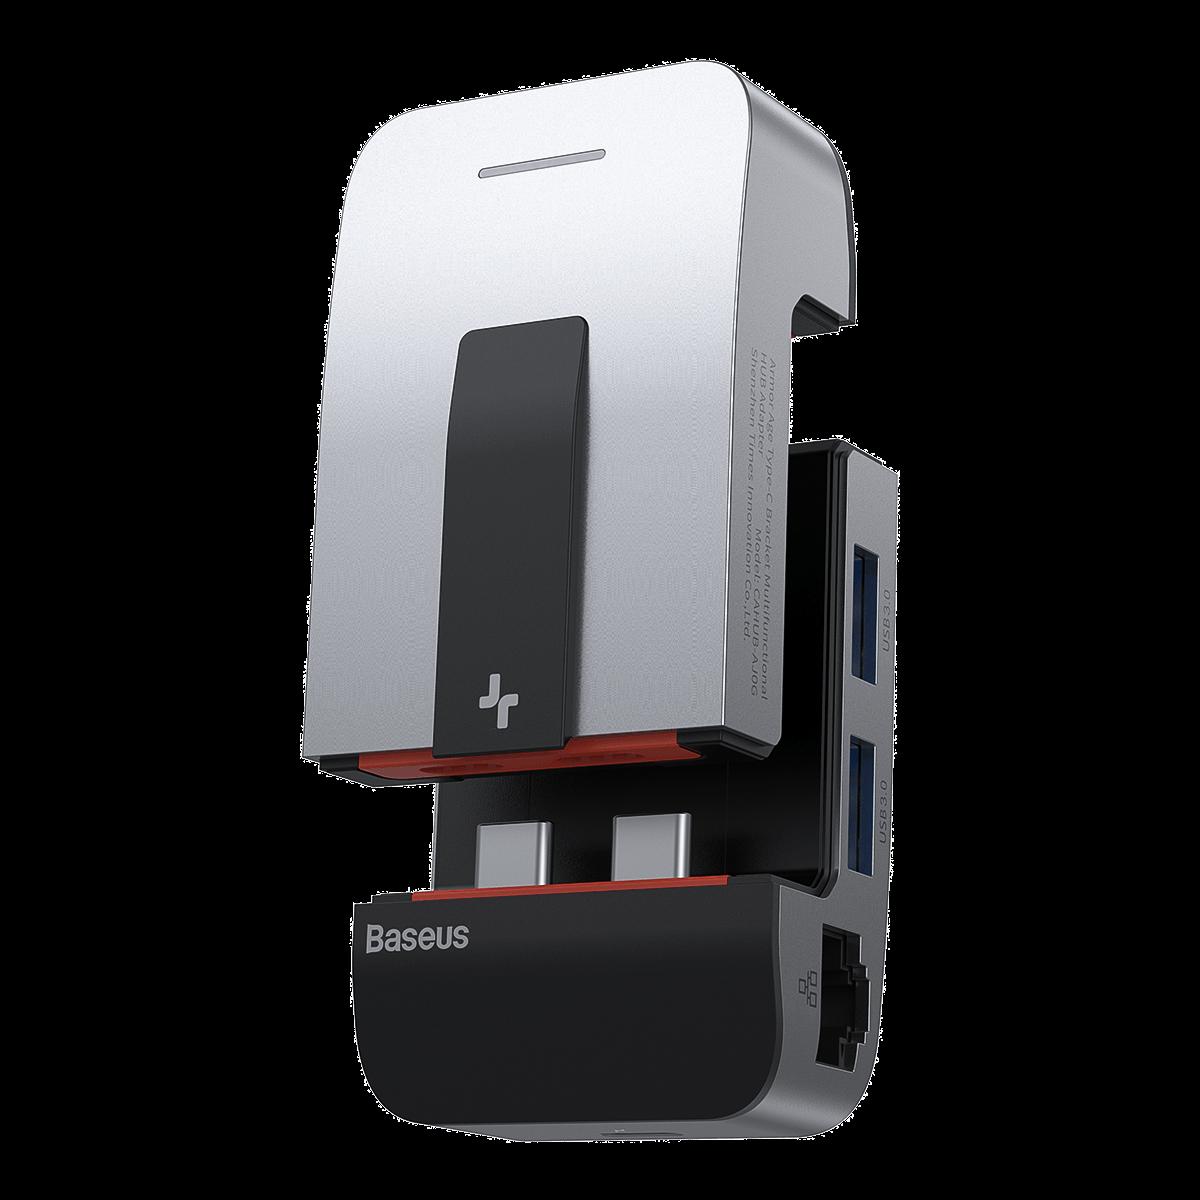 Baseus Type C Bracket Multifunctional HUB Speed Data Transfer USB Adapter For Notebook